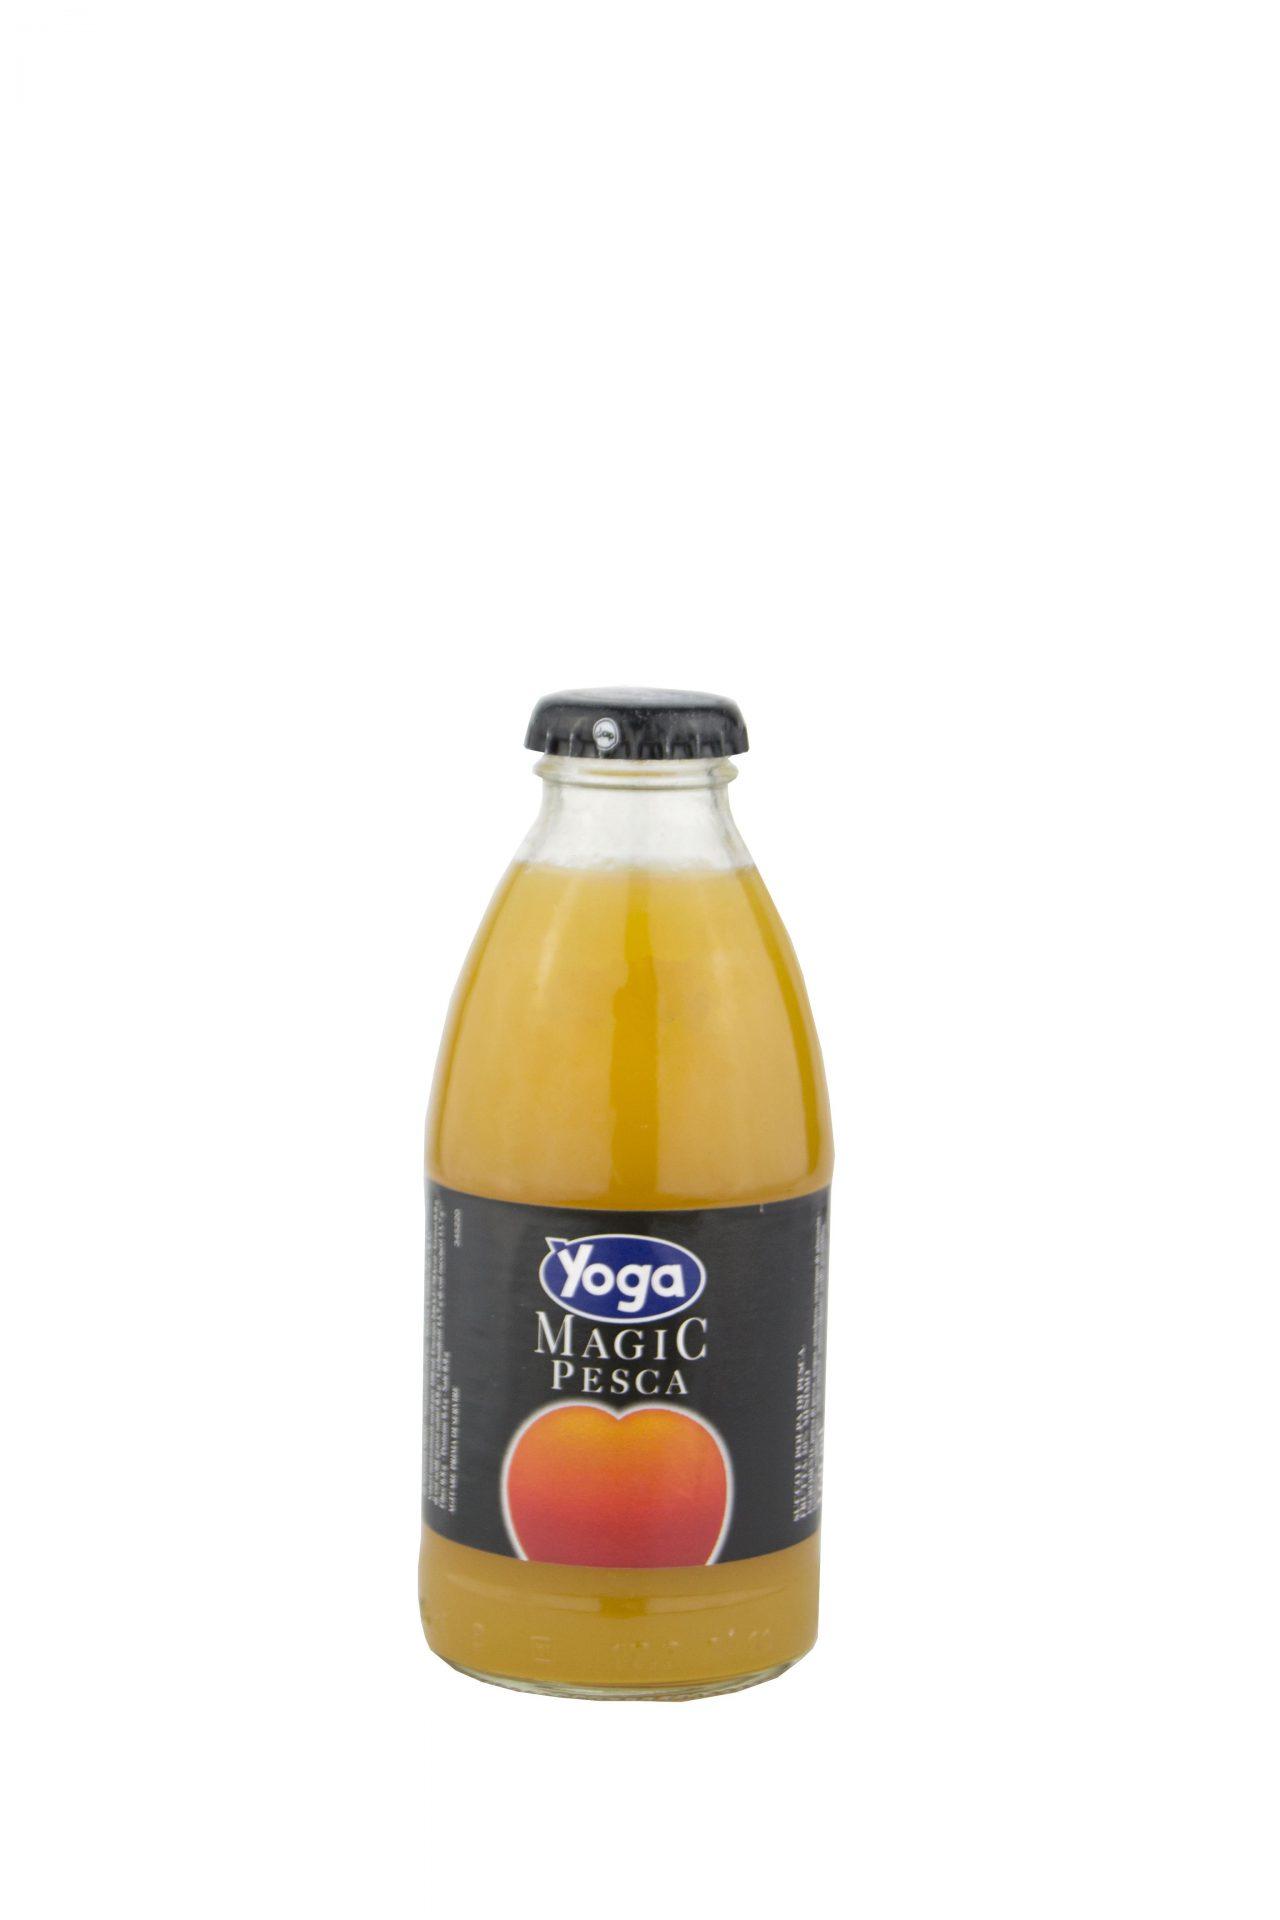 Yoga – Pesca 160 ml